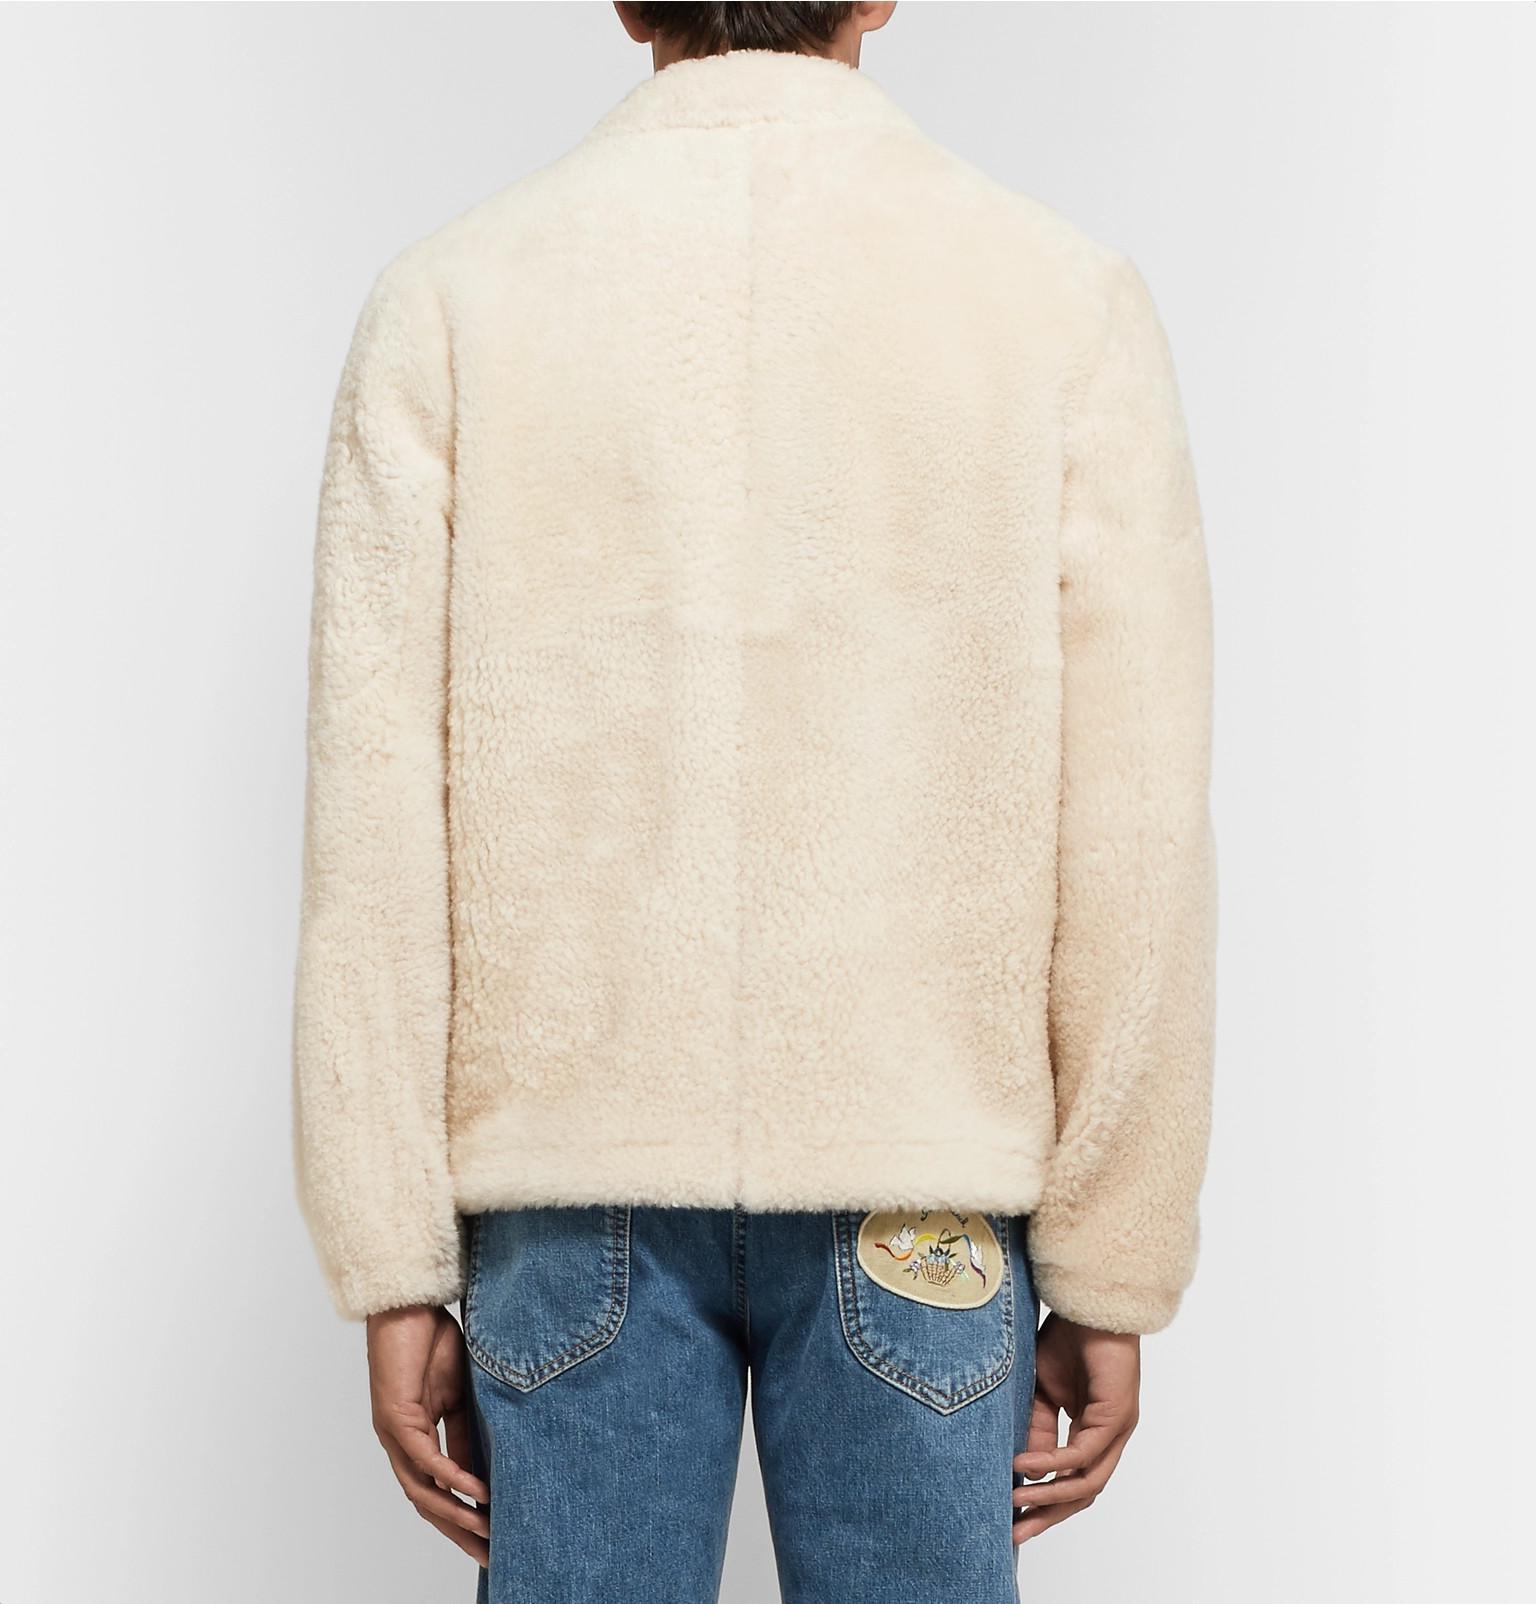 Loewe Denim Leather-trimmed Shearling Jacket in Cream (Natural) for Men